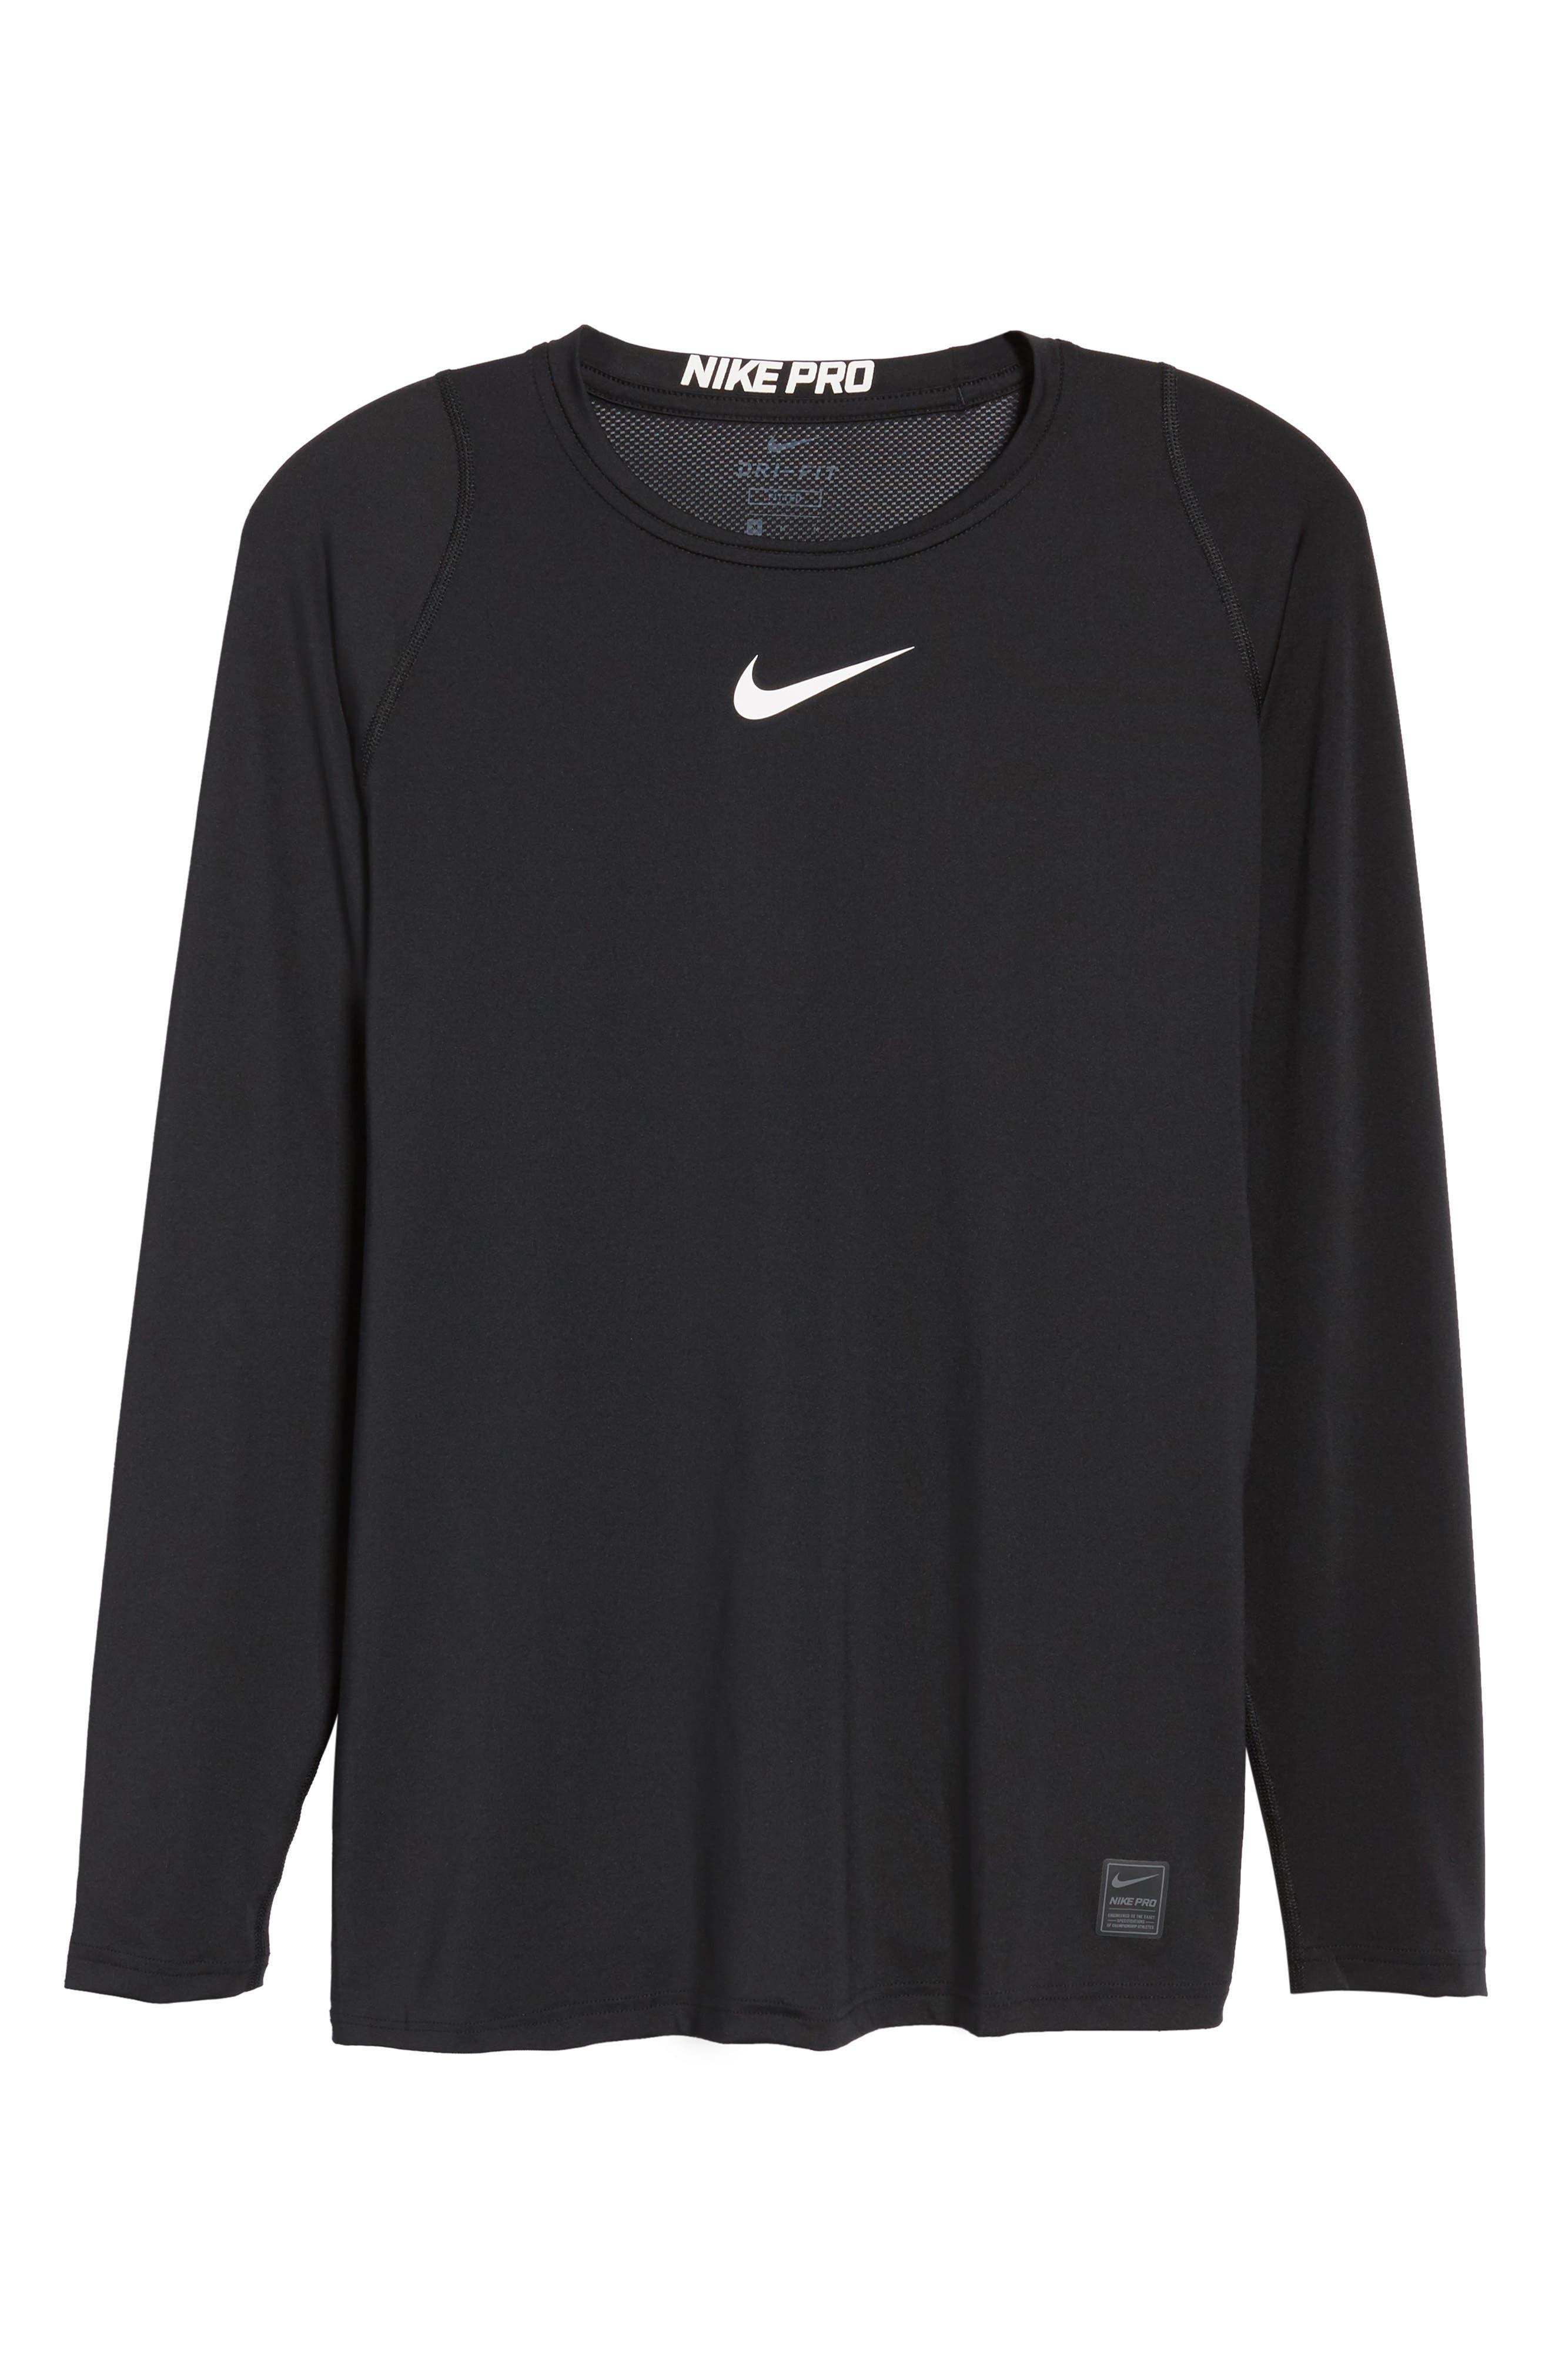 Pro Fitted Performance T-Shirt,                             Alternate thumbnail 6, color,                             BLACK/ WHITE/ WHITE